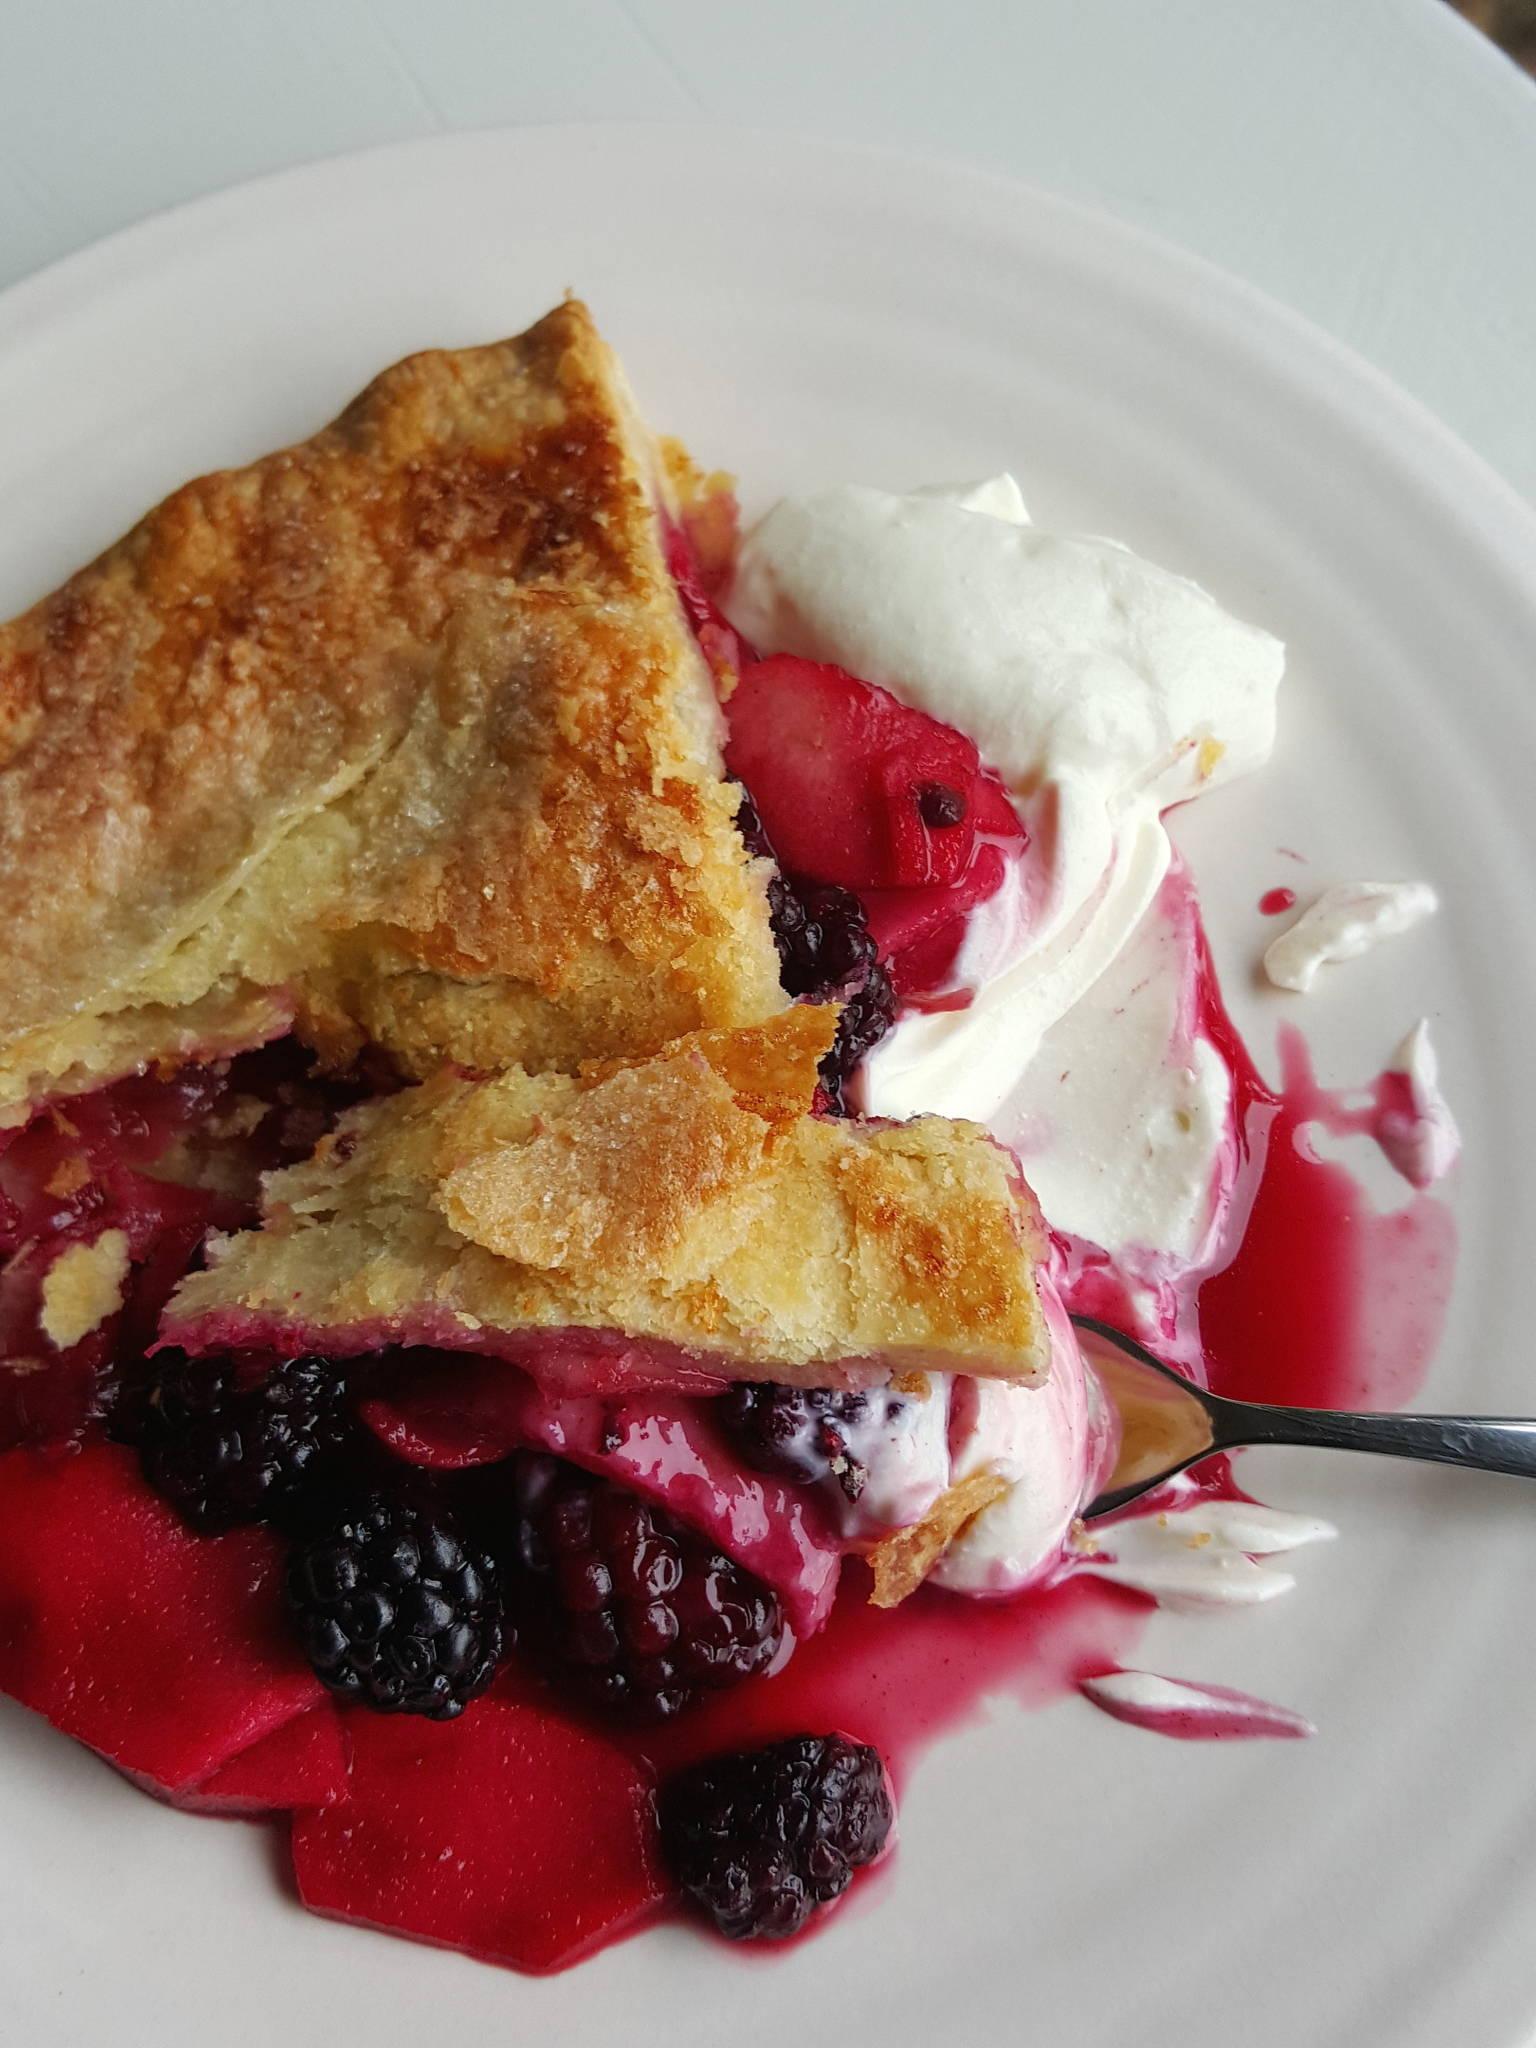 Blackberry & apple pie slice